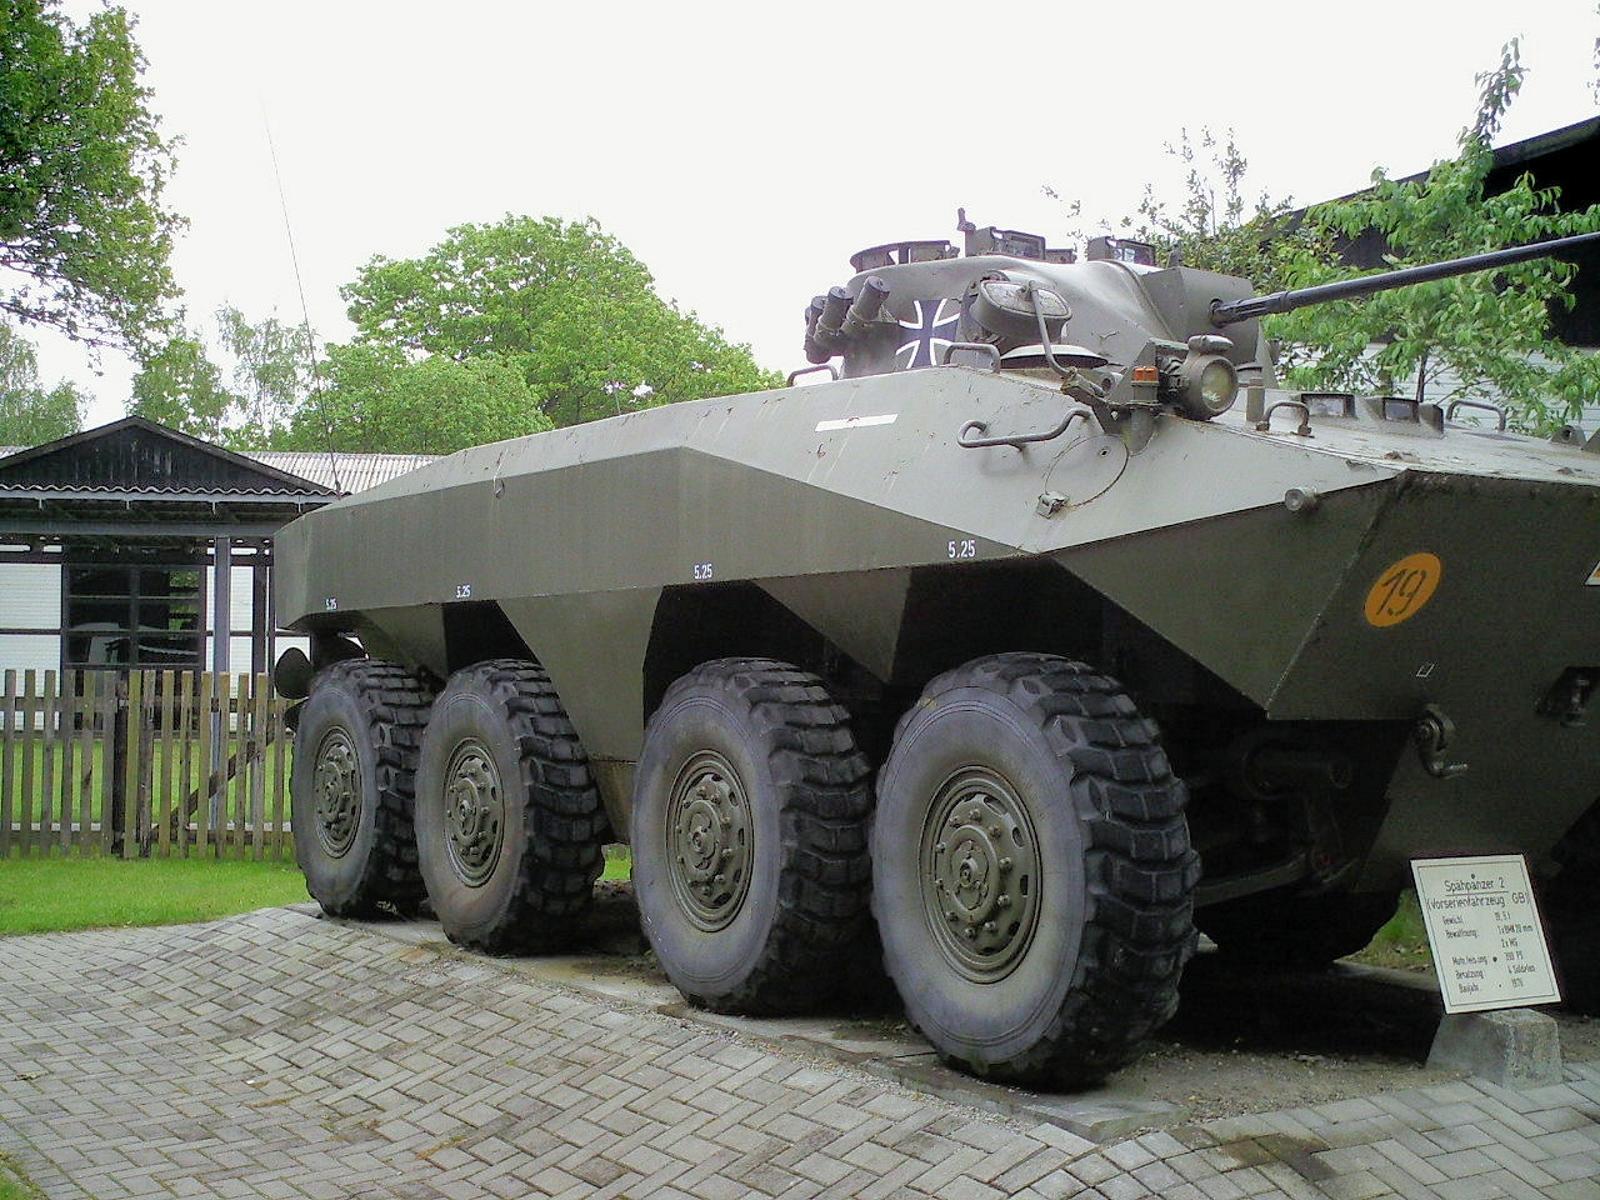 Prototyp Spahpanzer 2